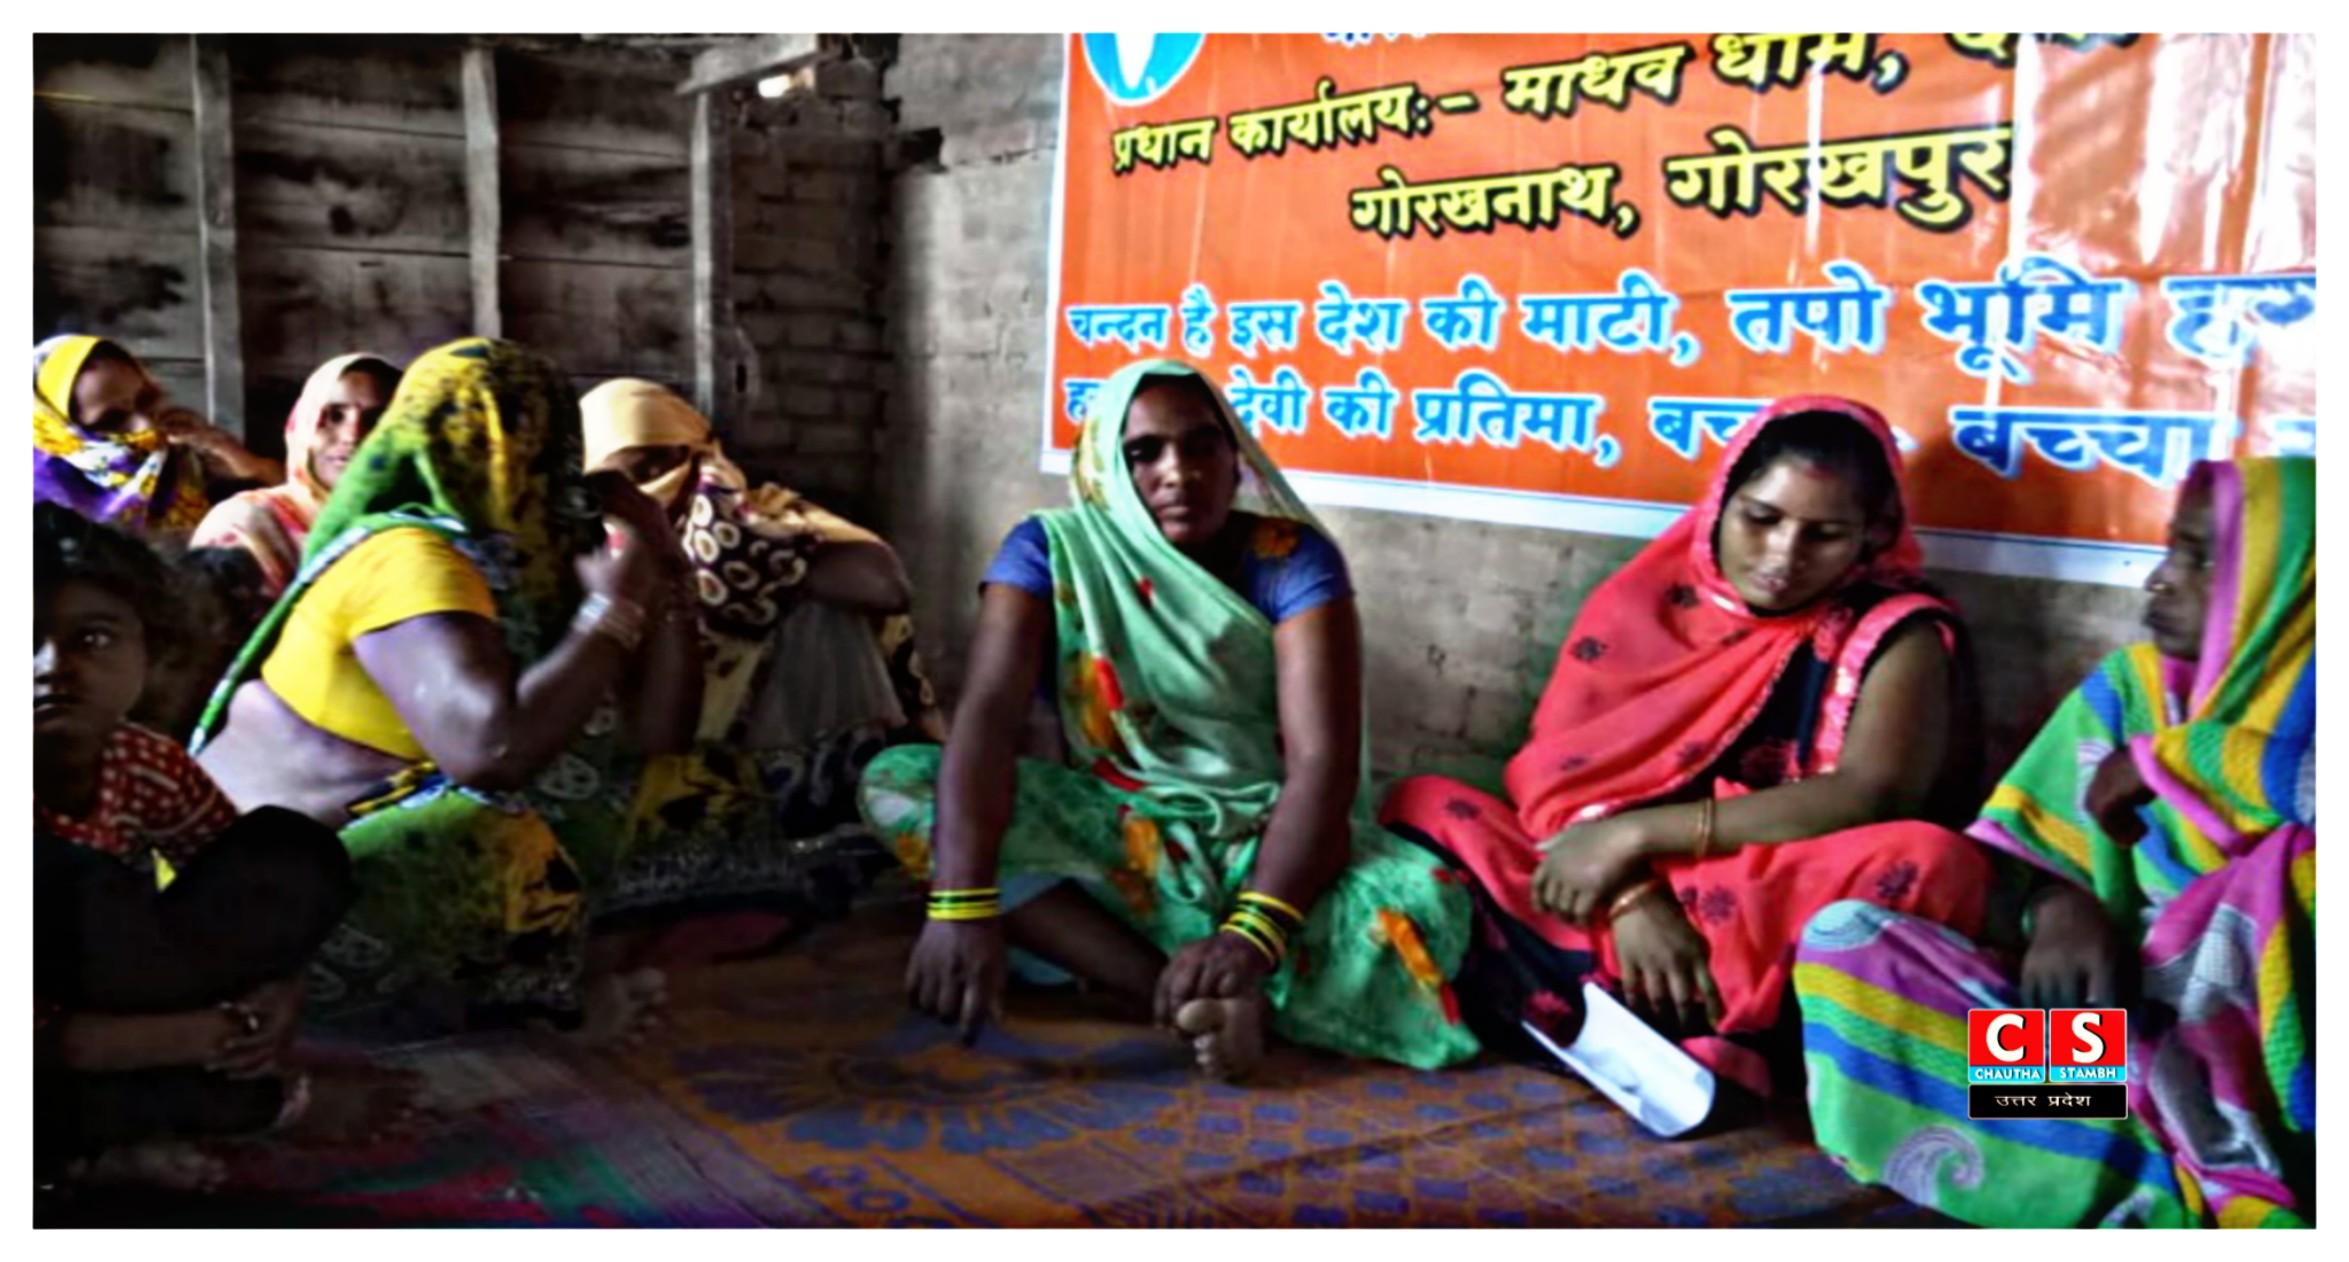 #Seva_Bharti_HathRas_CHAUTHA_STAMBH_News_UttarPradesh1